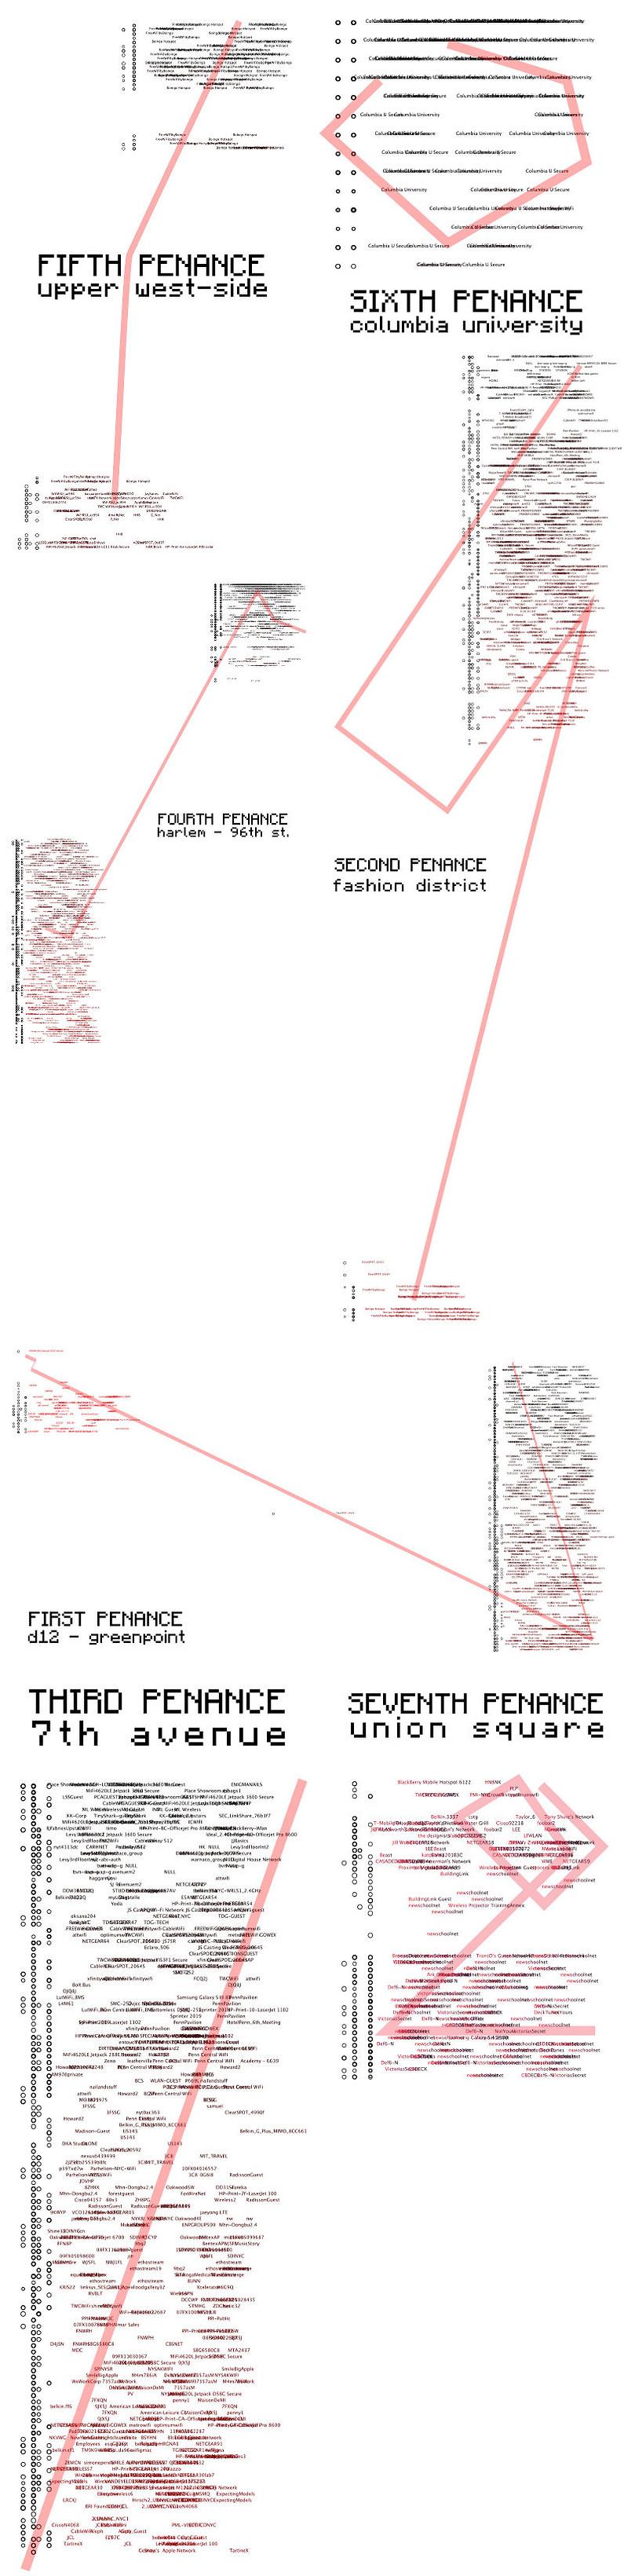 data-viz.jpg